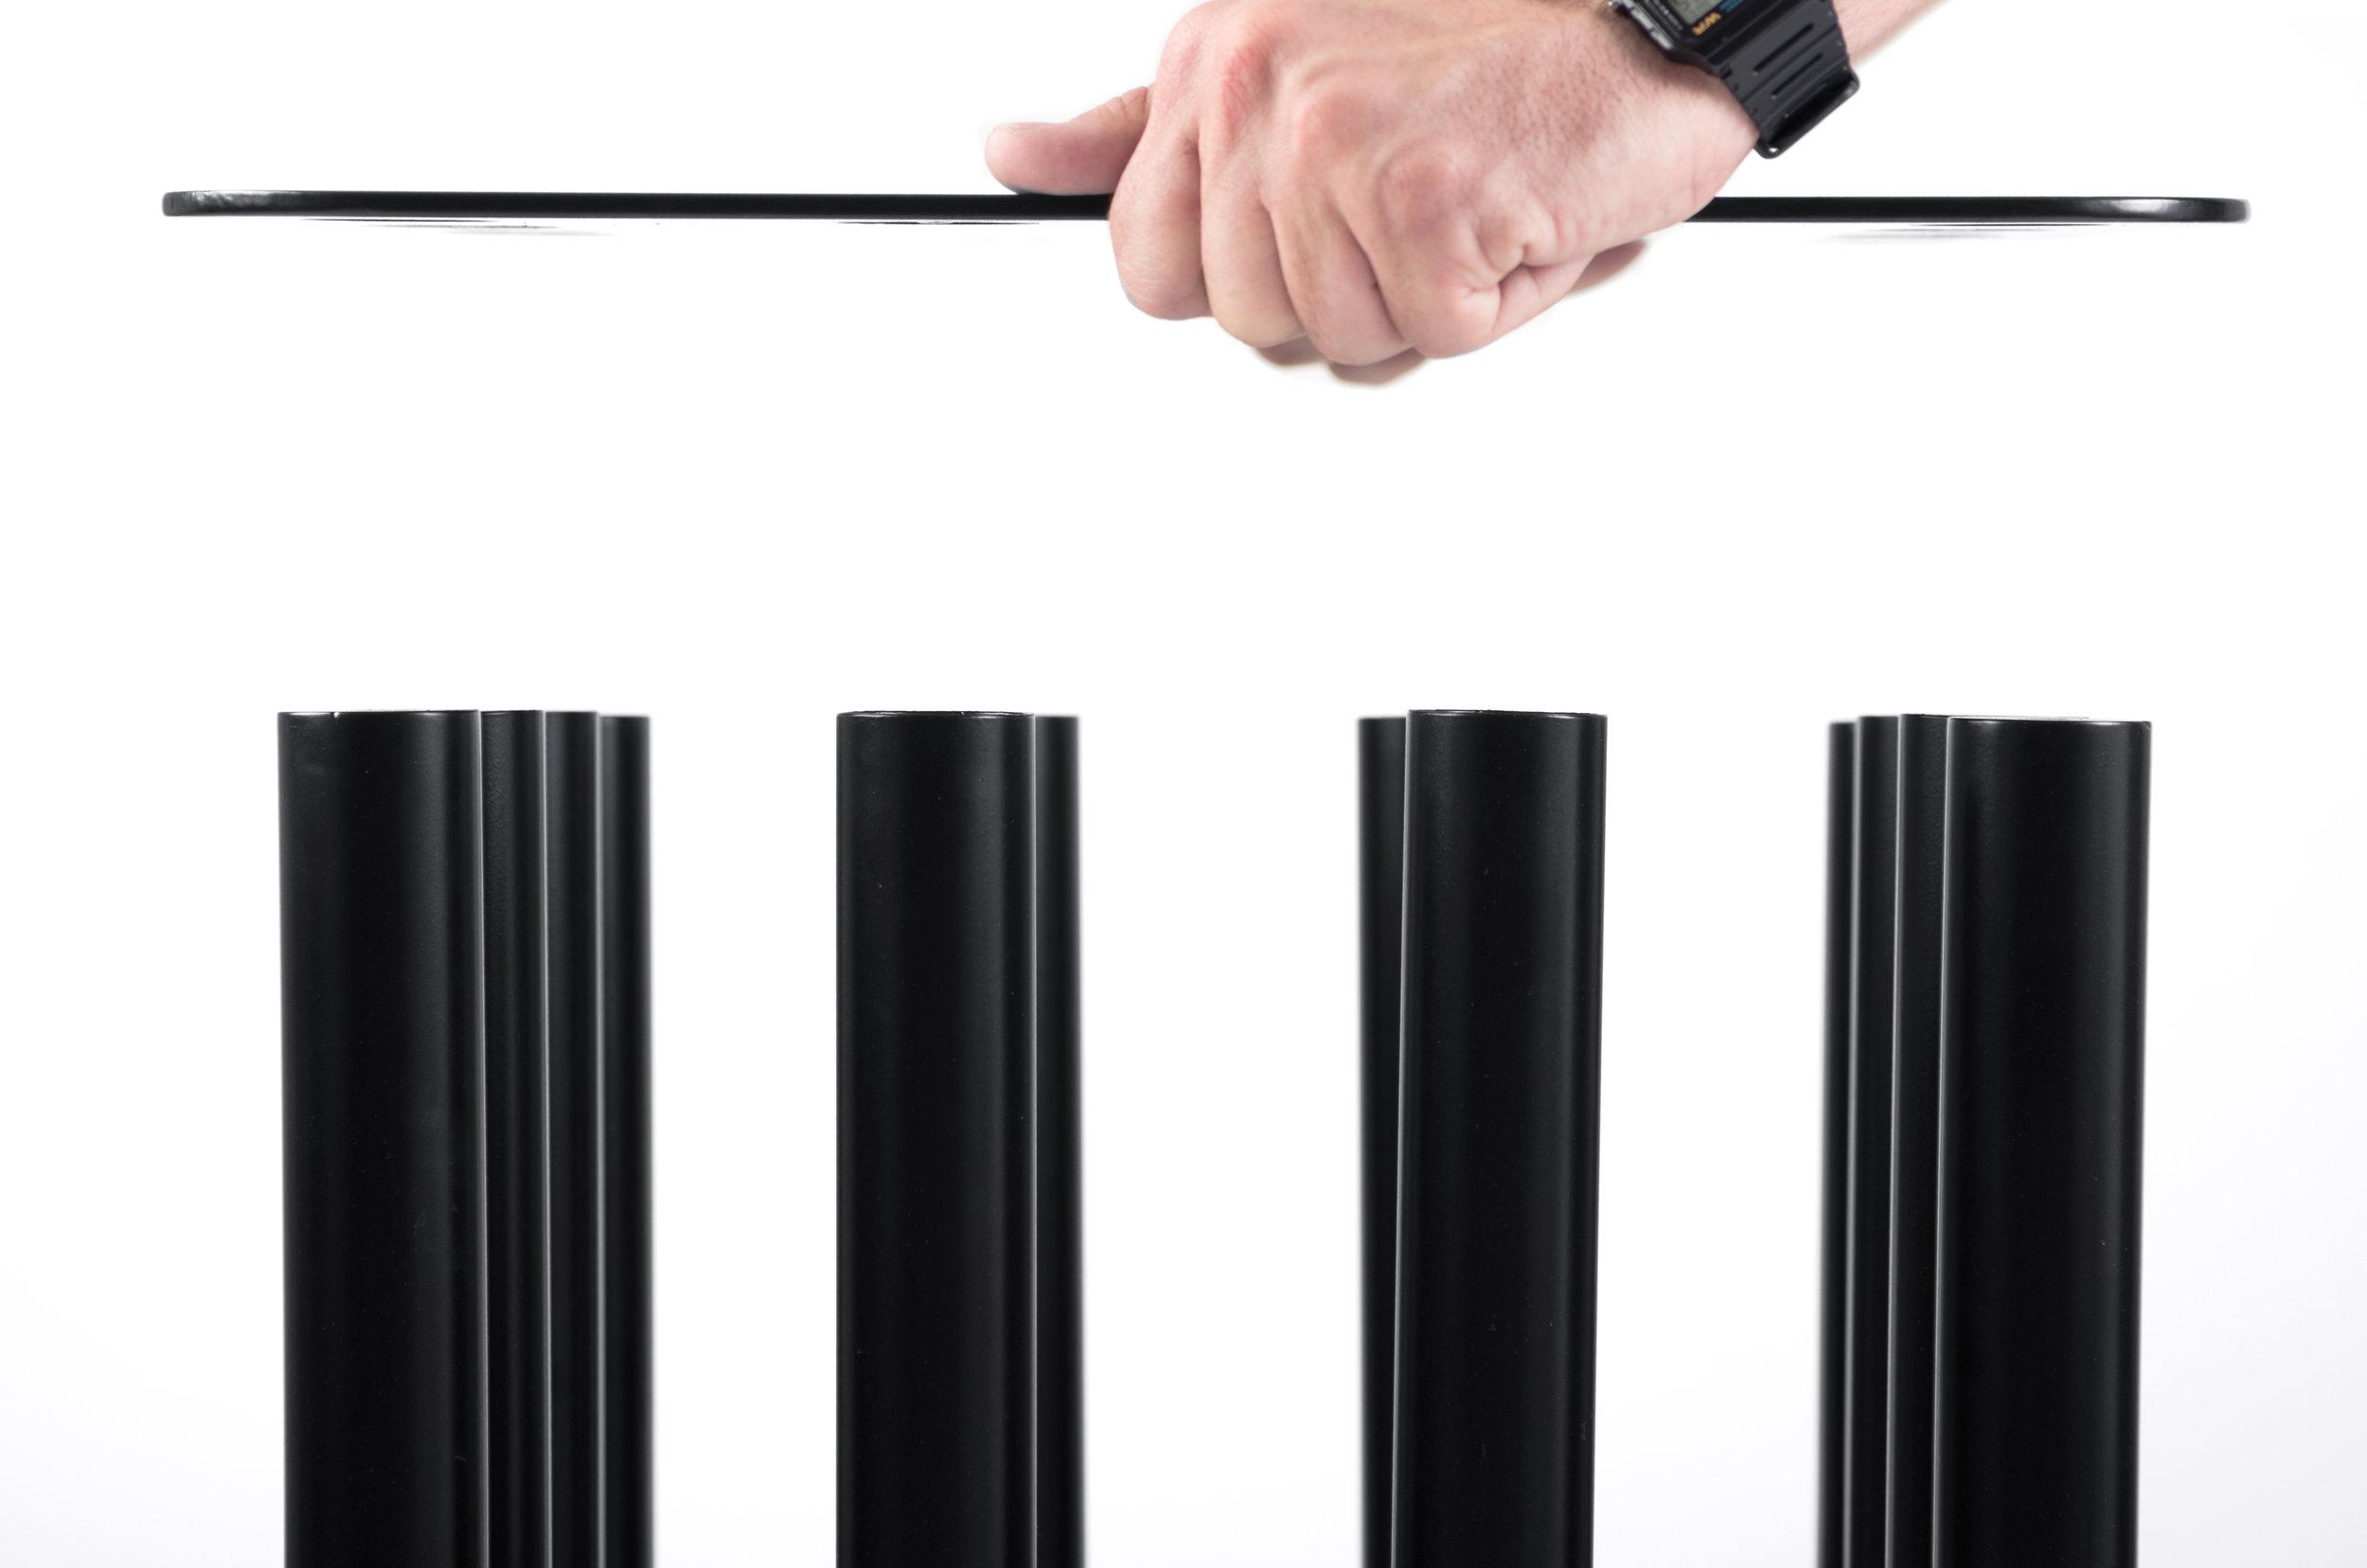 jorge-diego-etienne-cages-9